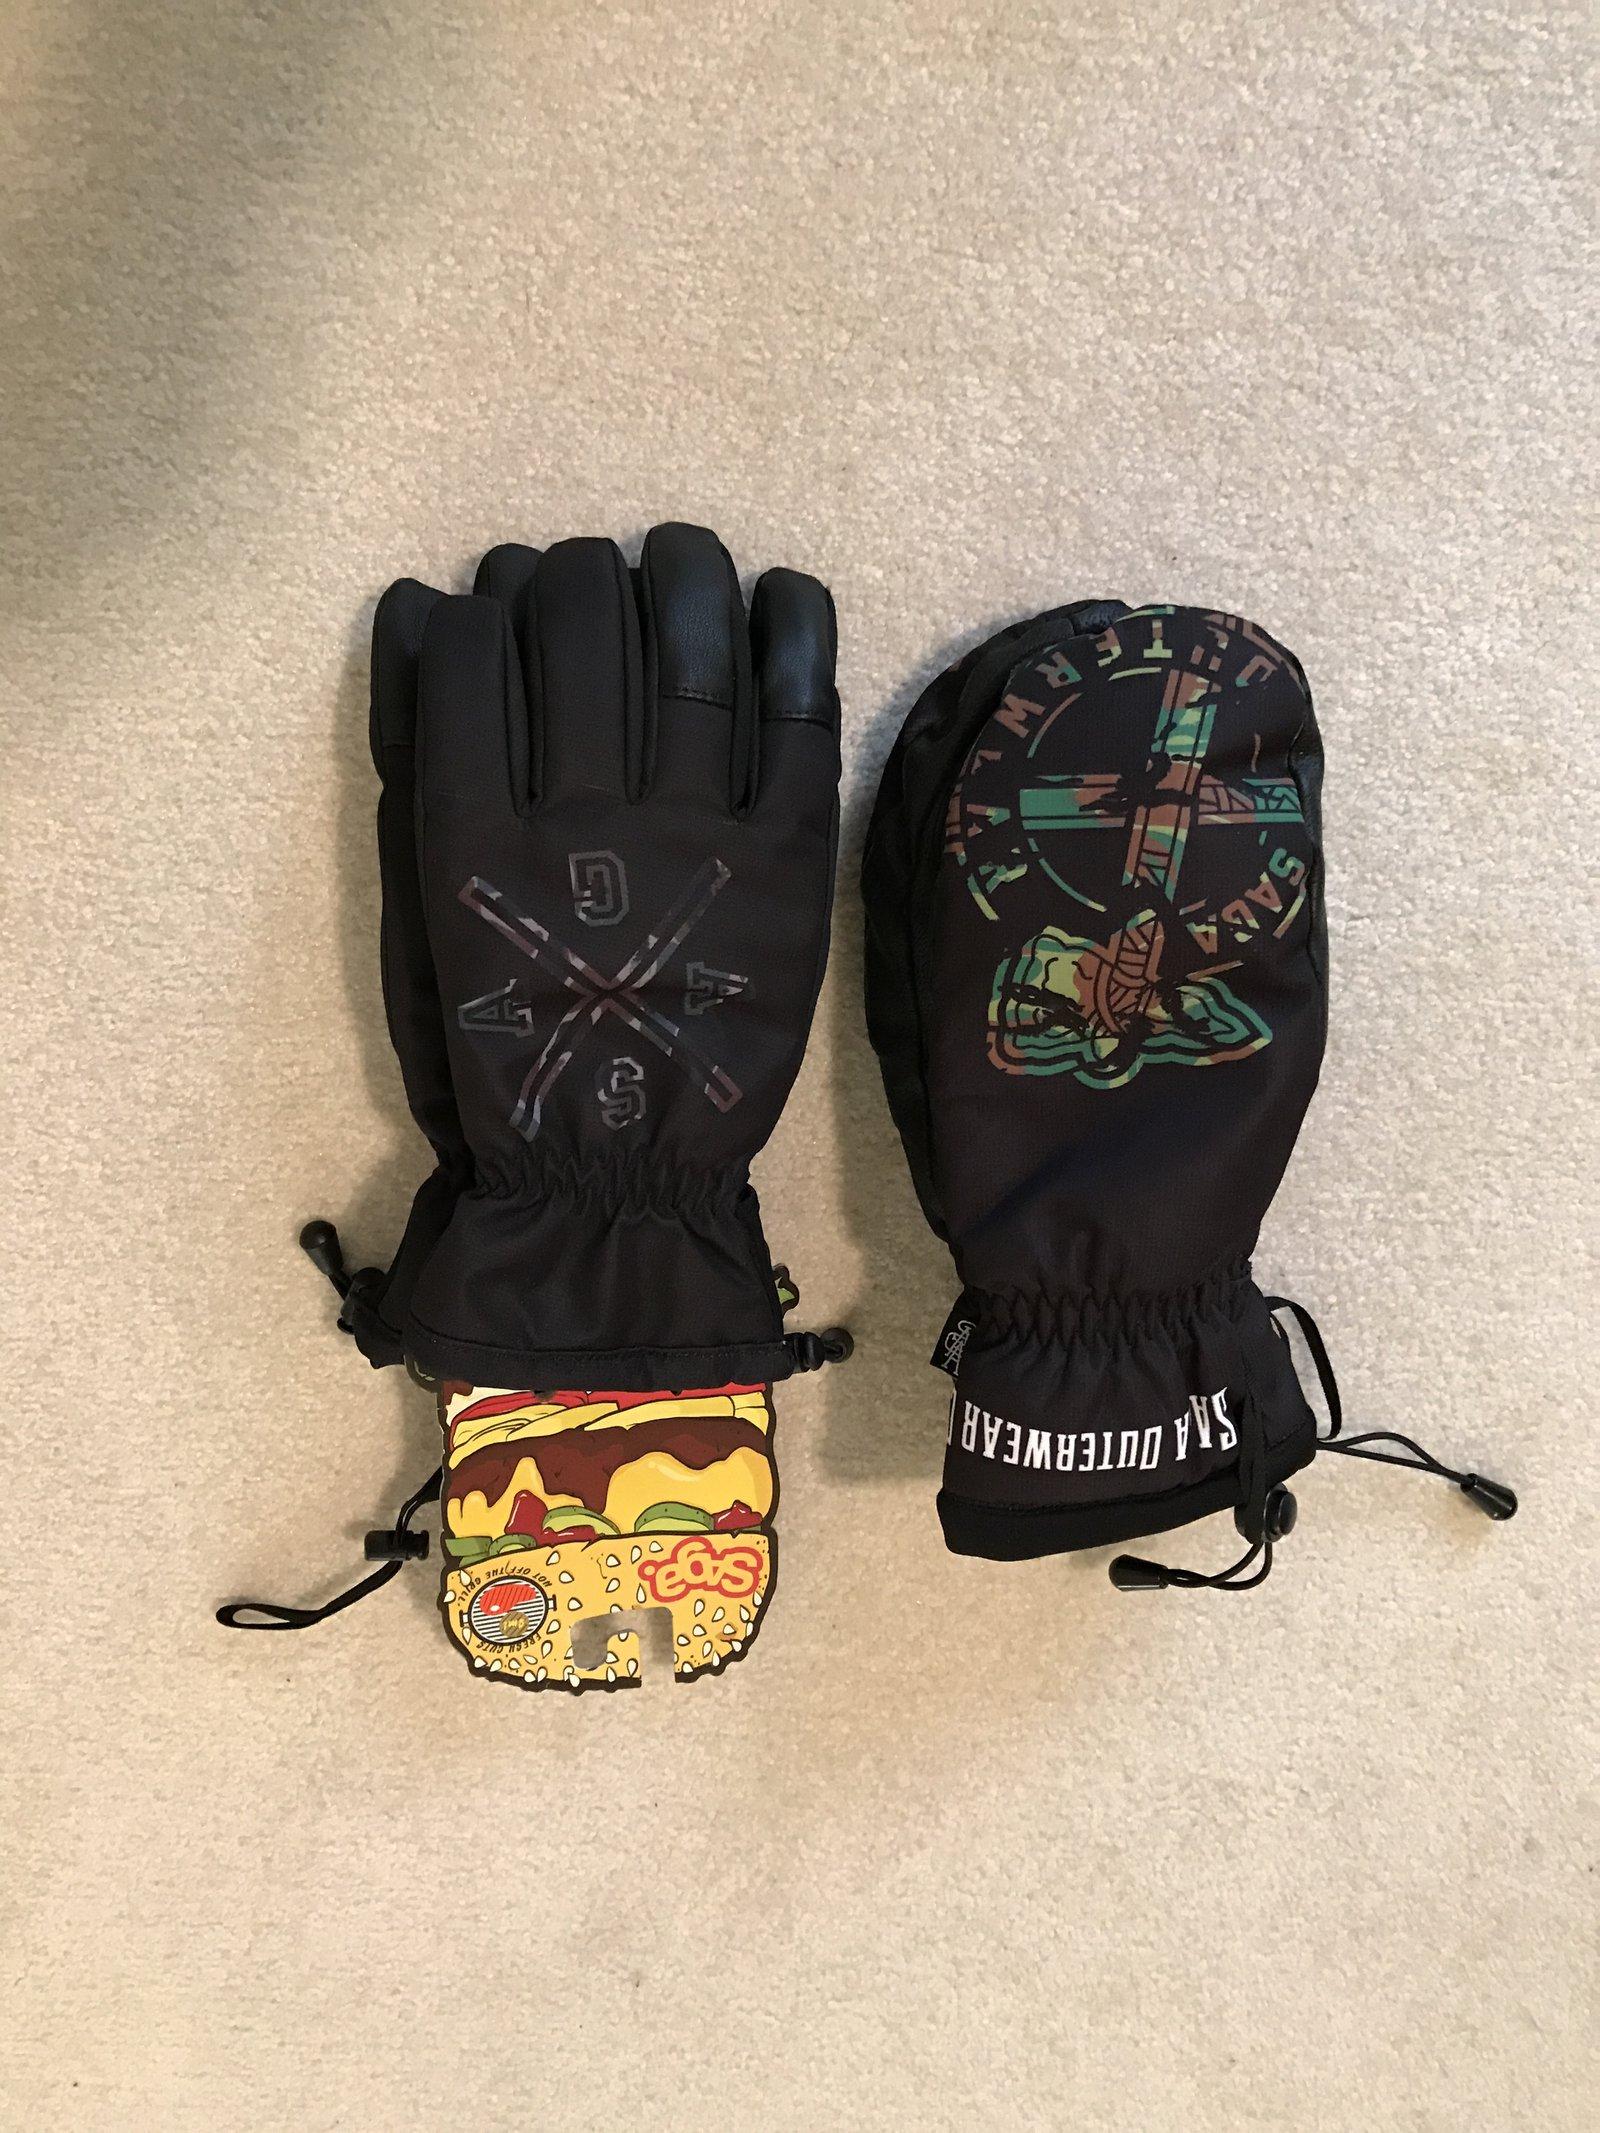 Saga Mitts / Gloves